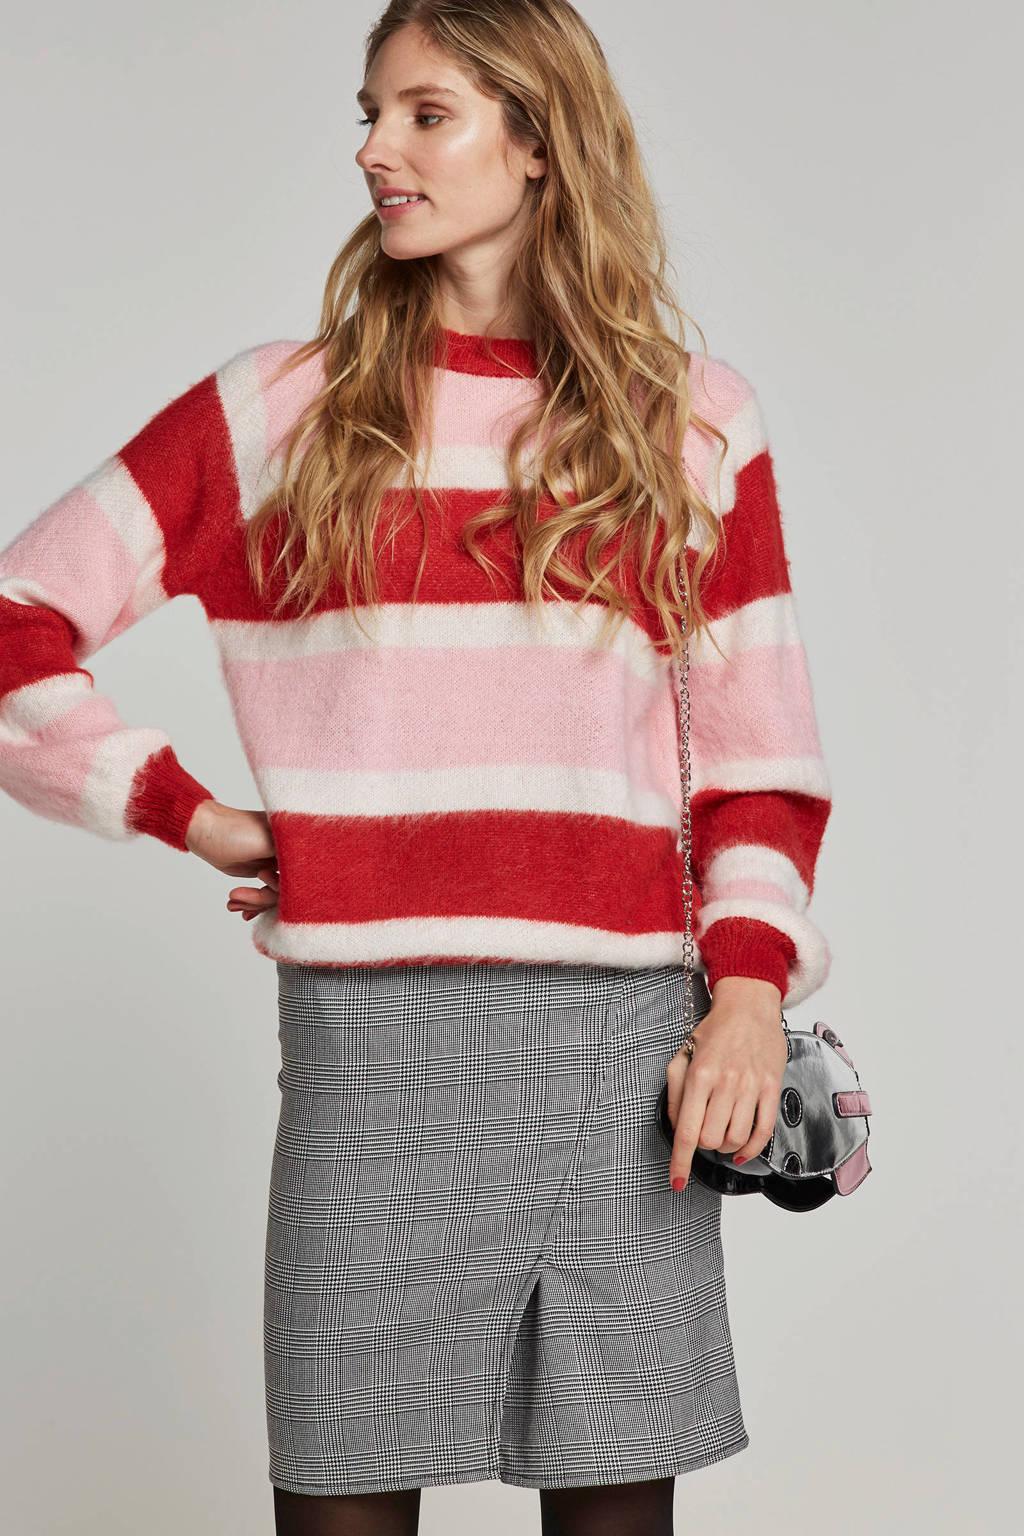 PIECES gestreepte trui rood/roze//wit, Rood/roze//wit